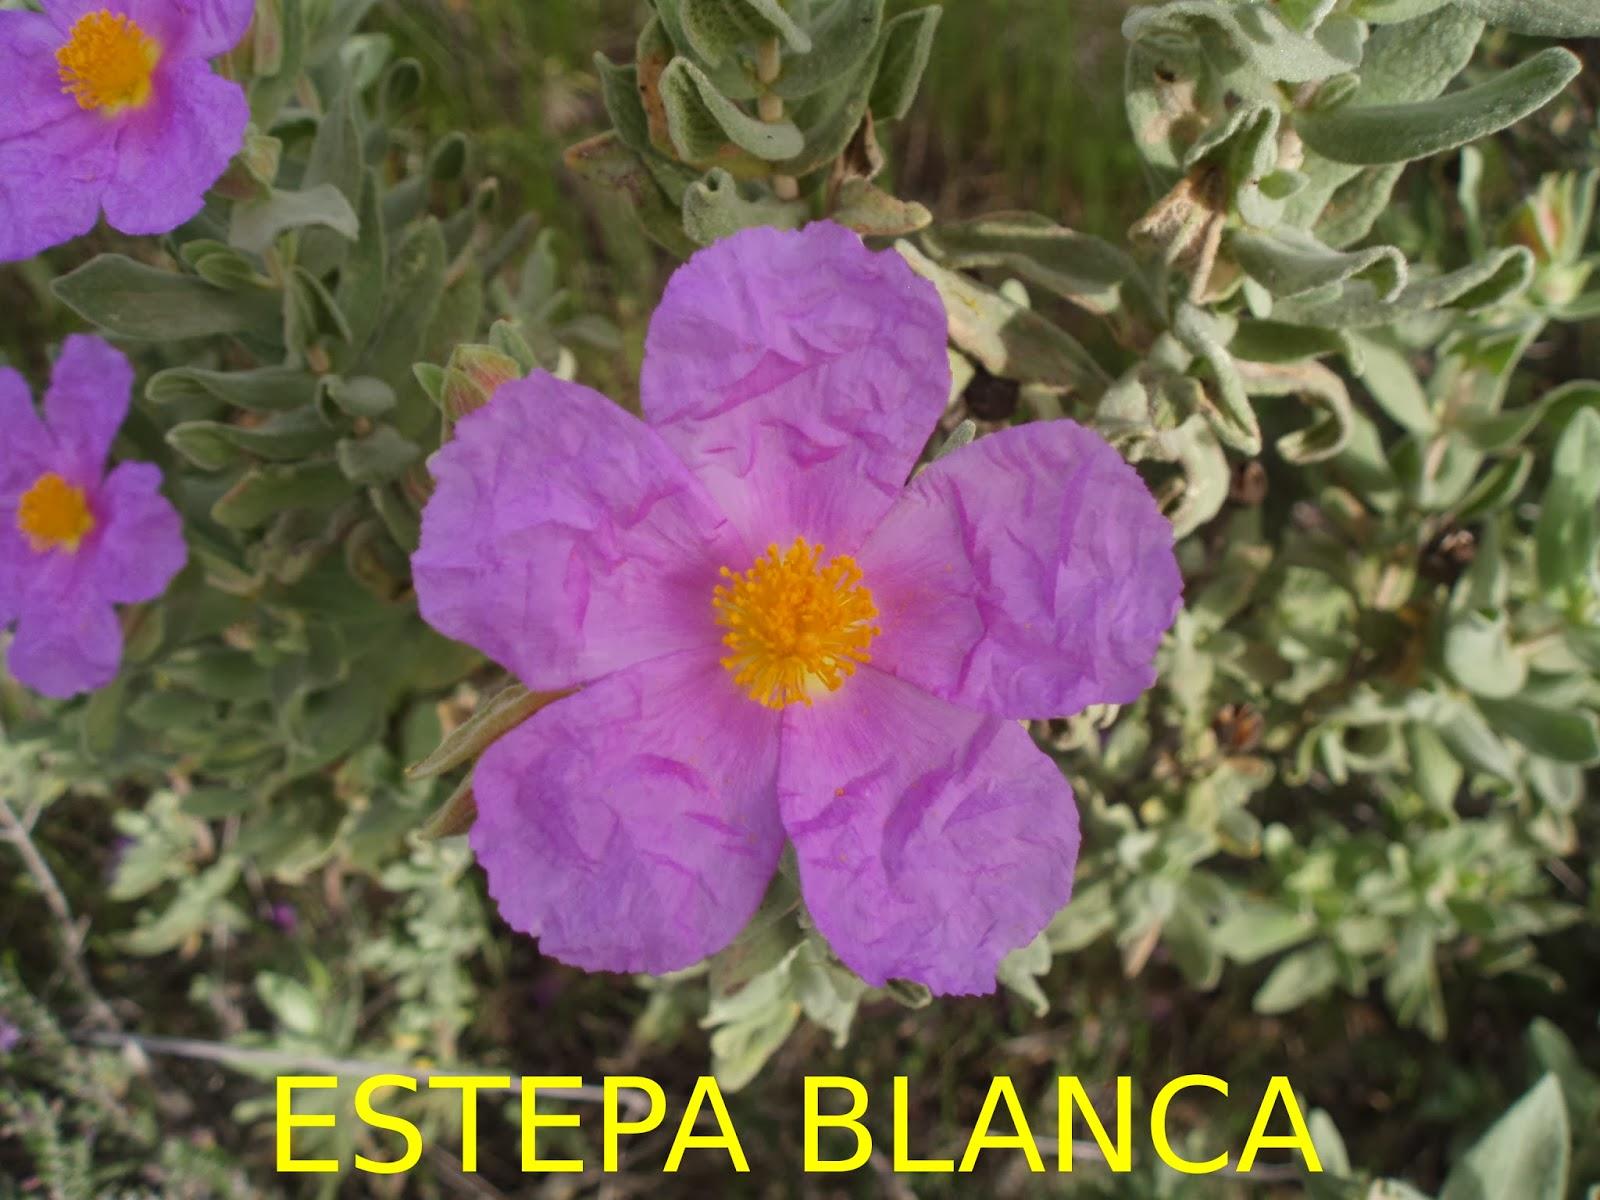 http://edambientalcervantes.blogspot.com.es/p/blog-page.html